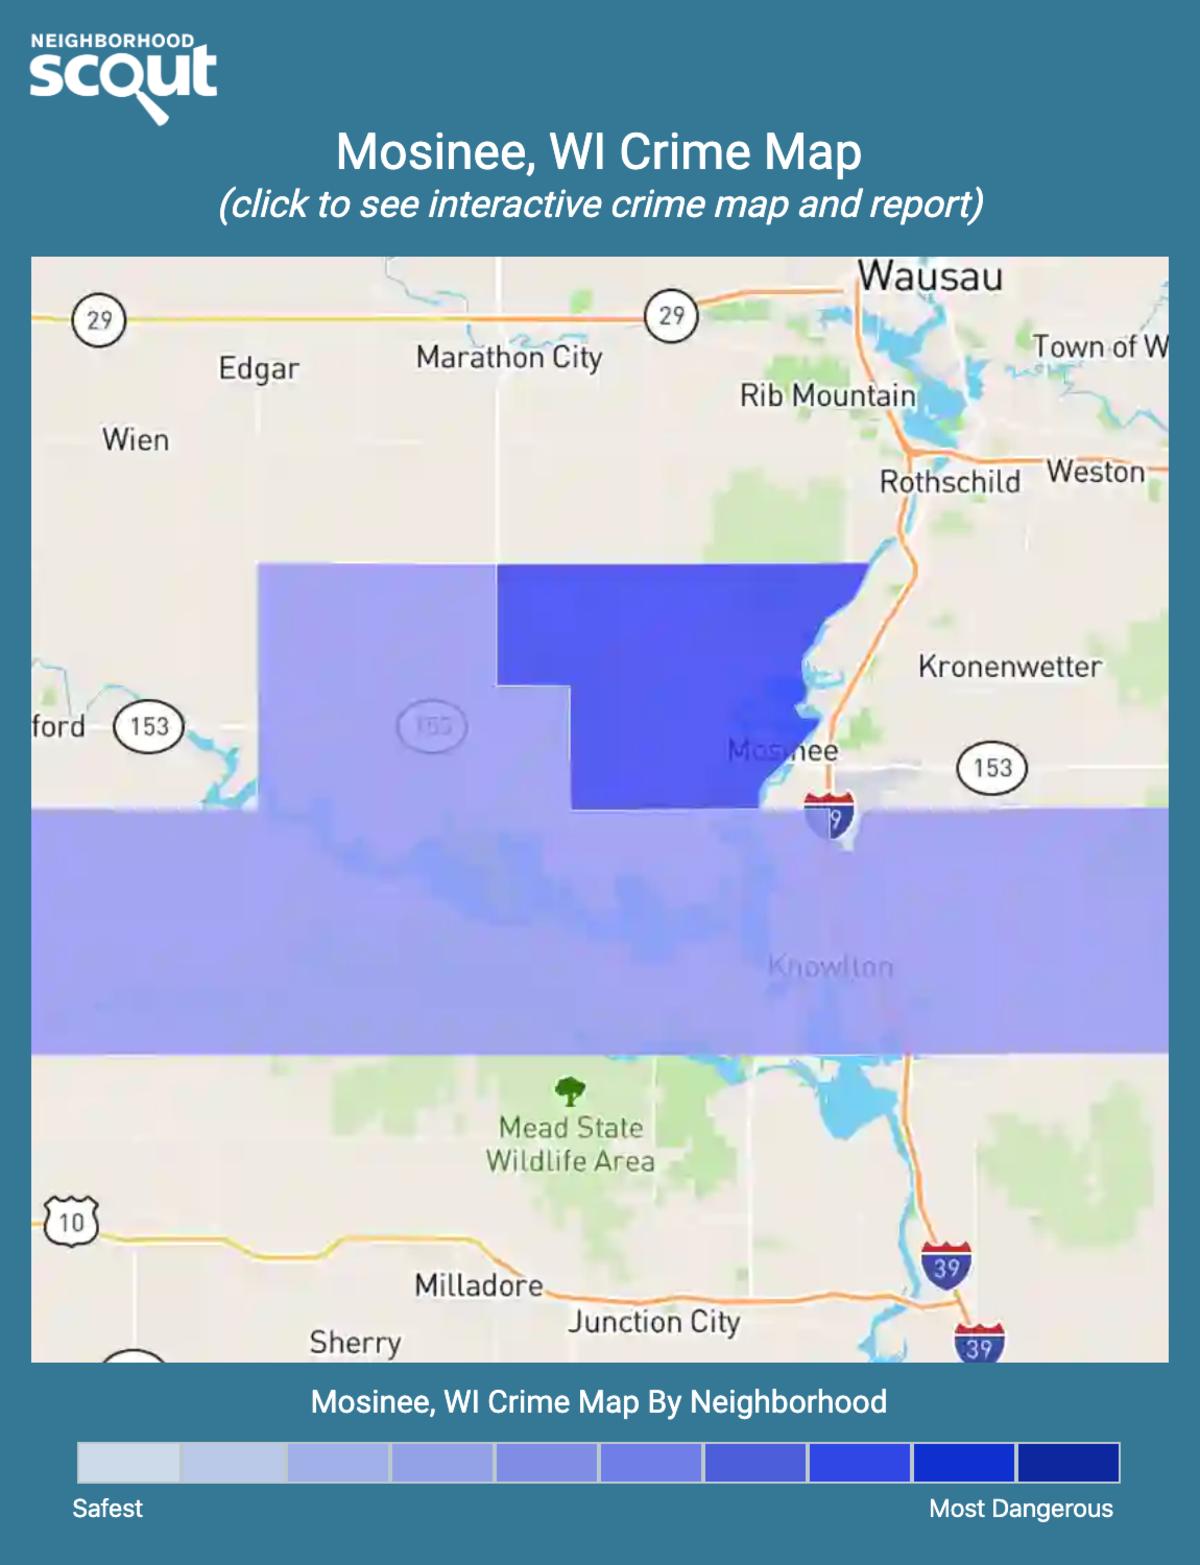 Mosinee, Wisconsin crime map